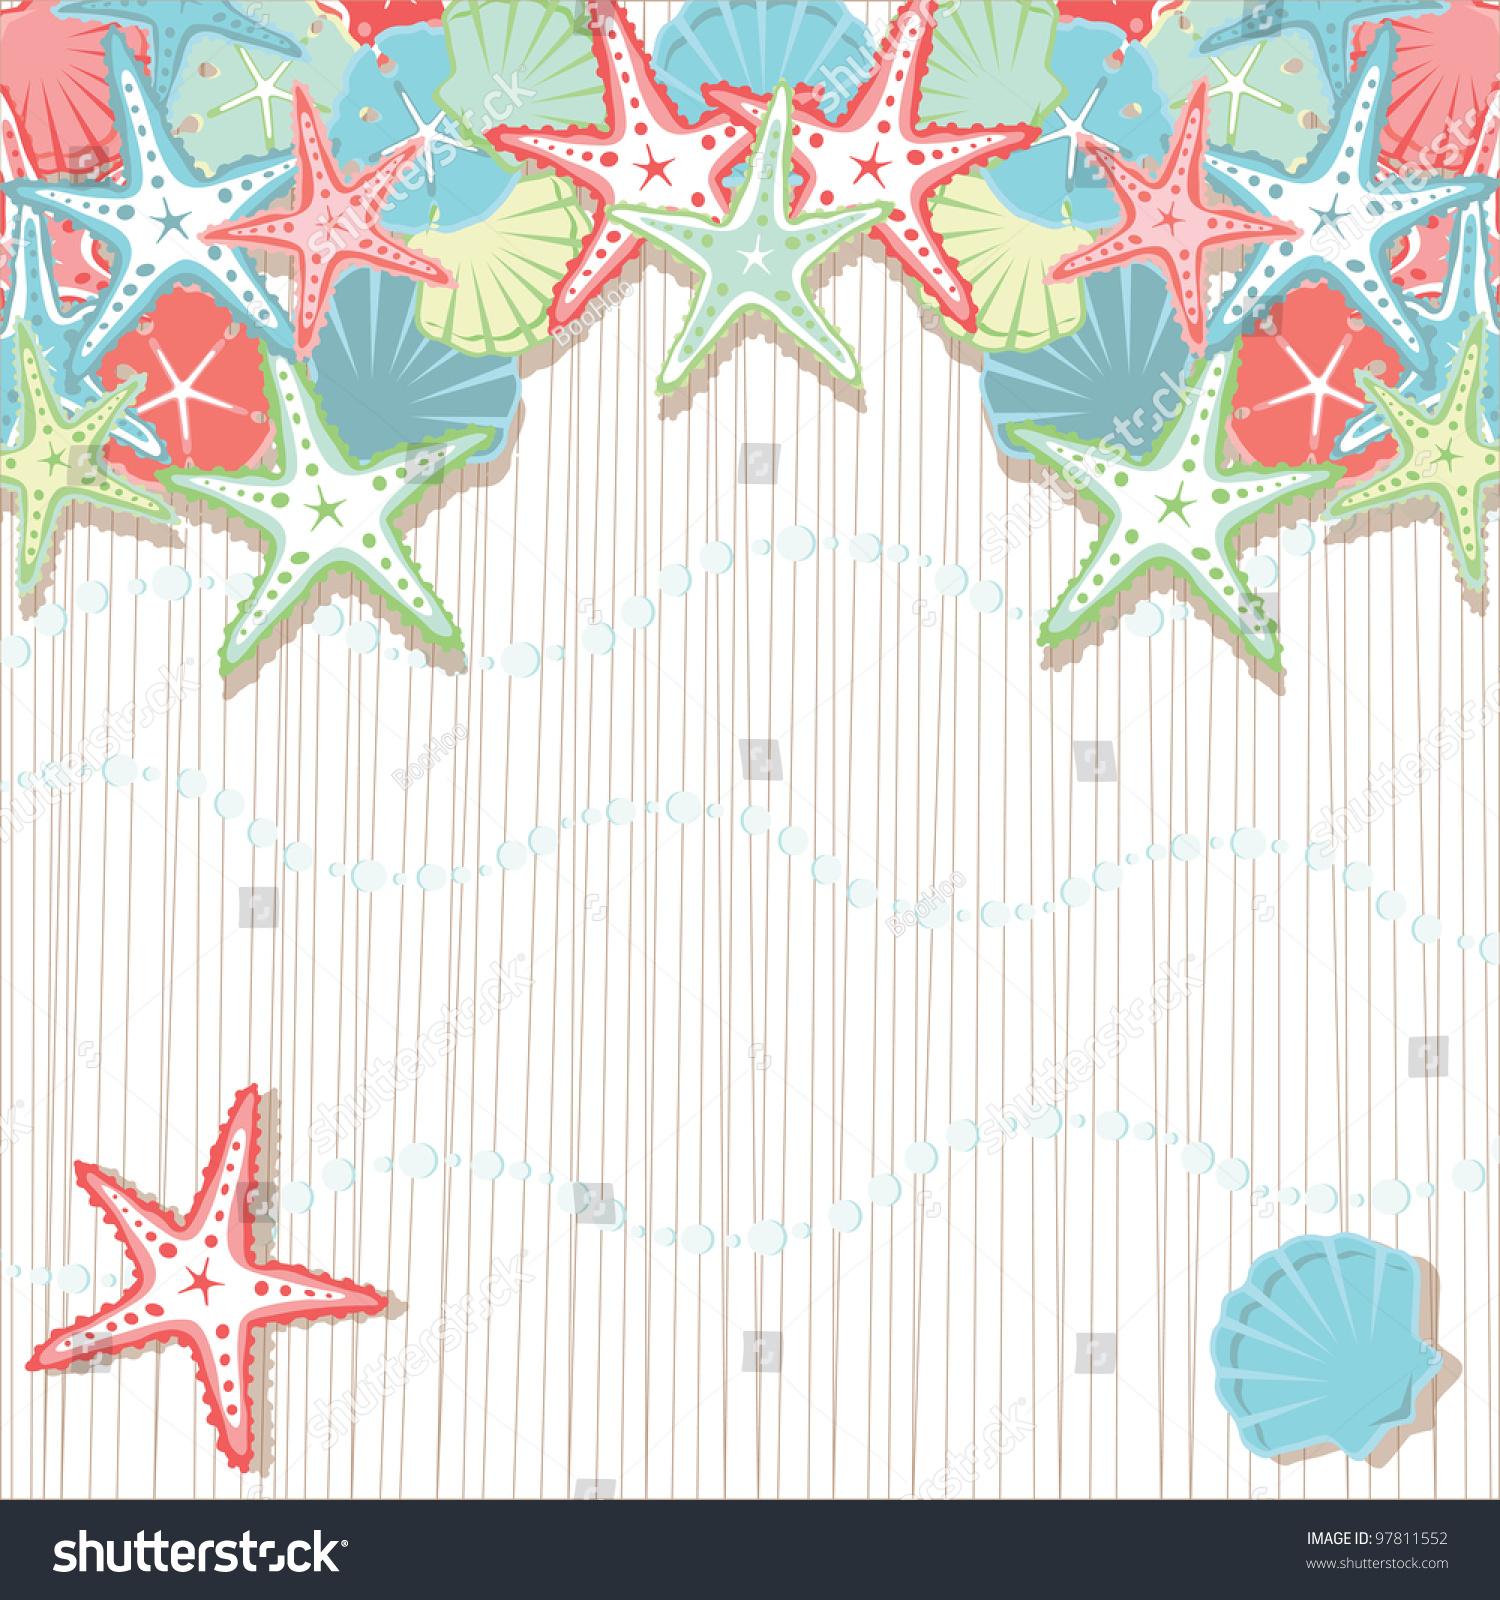 Beach Theme Card Stock: Seashell Beach Party Invitations Soft Colored Stock Vector